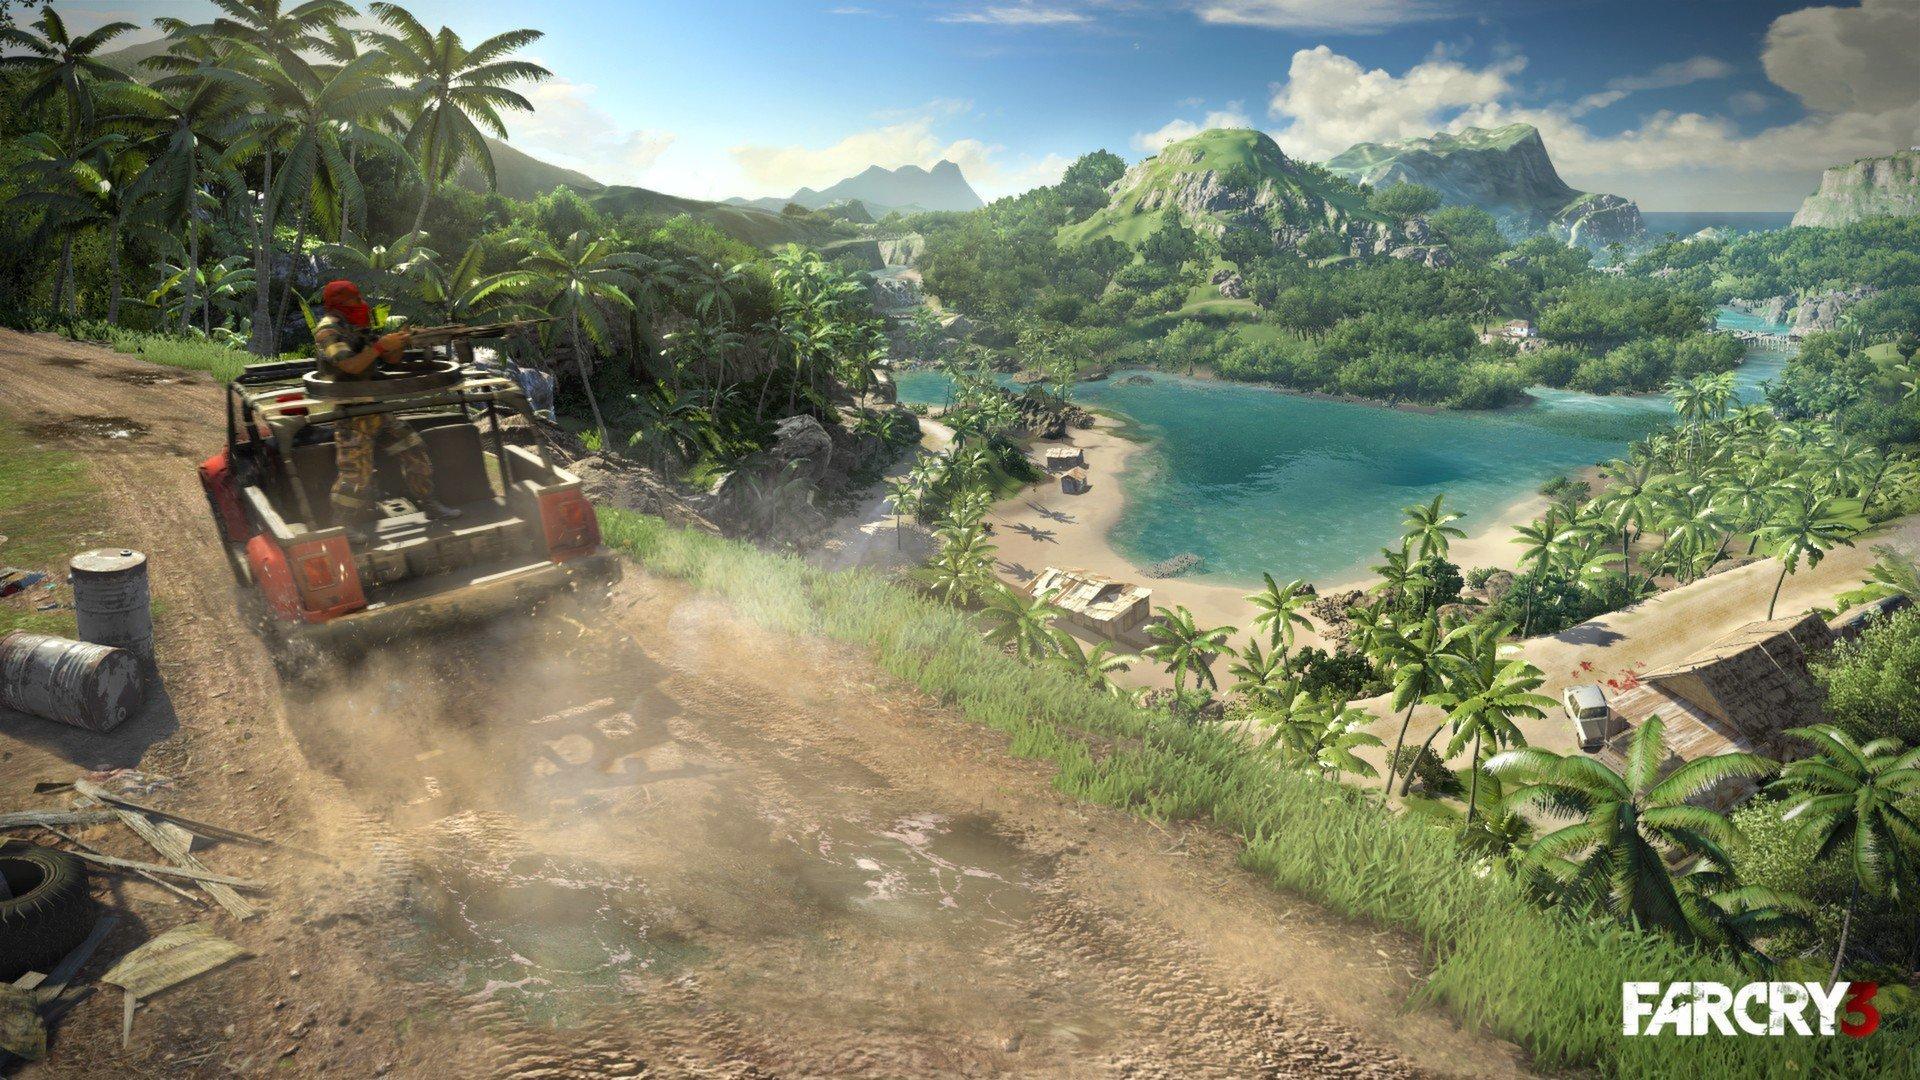 Wallpaper Video Games Far Cry 3 1920x1080 Utp 1171940 Hd